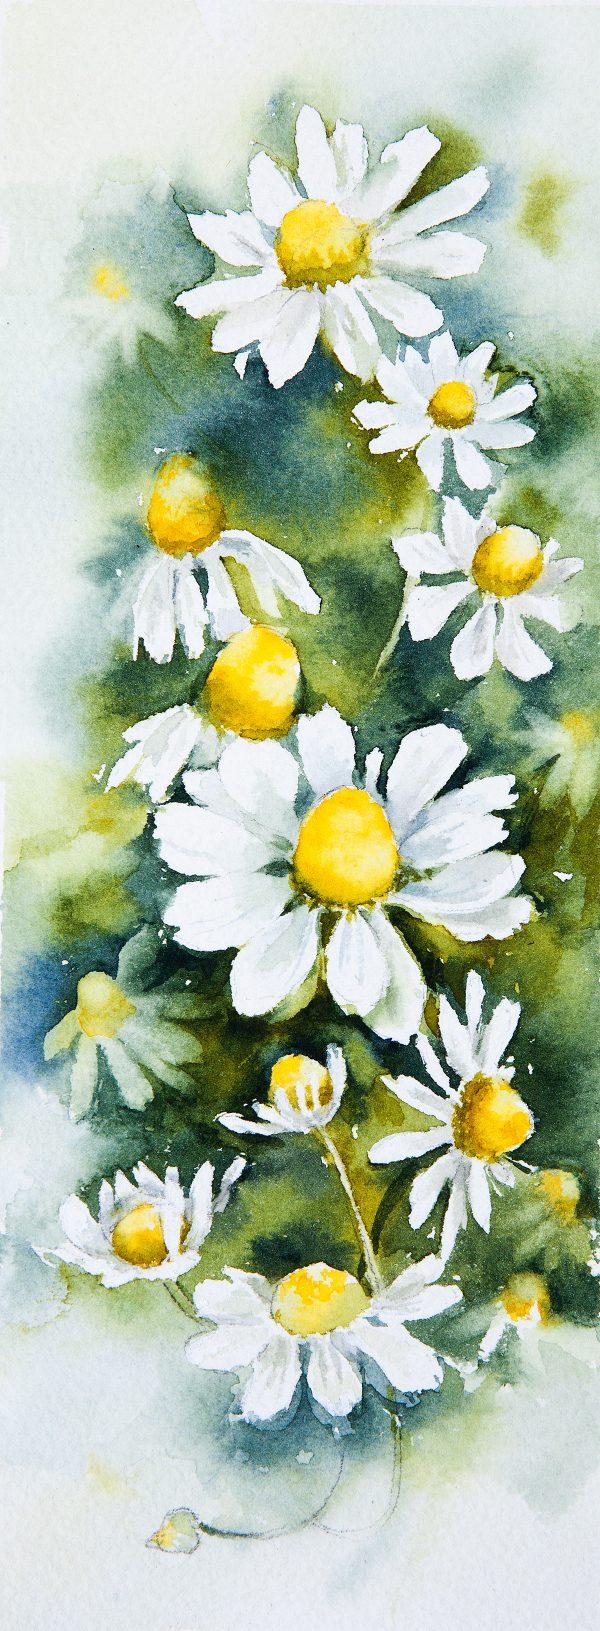 Daisies in watercolor, paintings by Elena Moroz